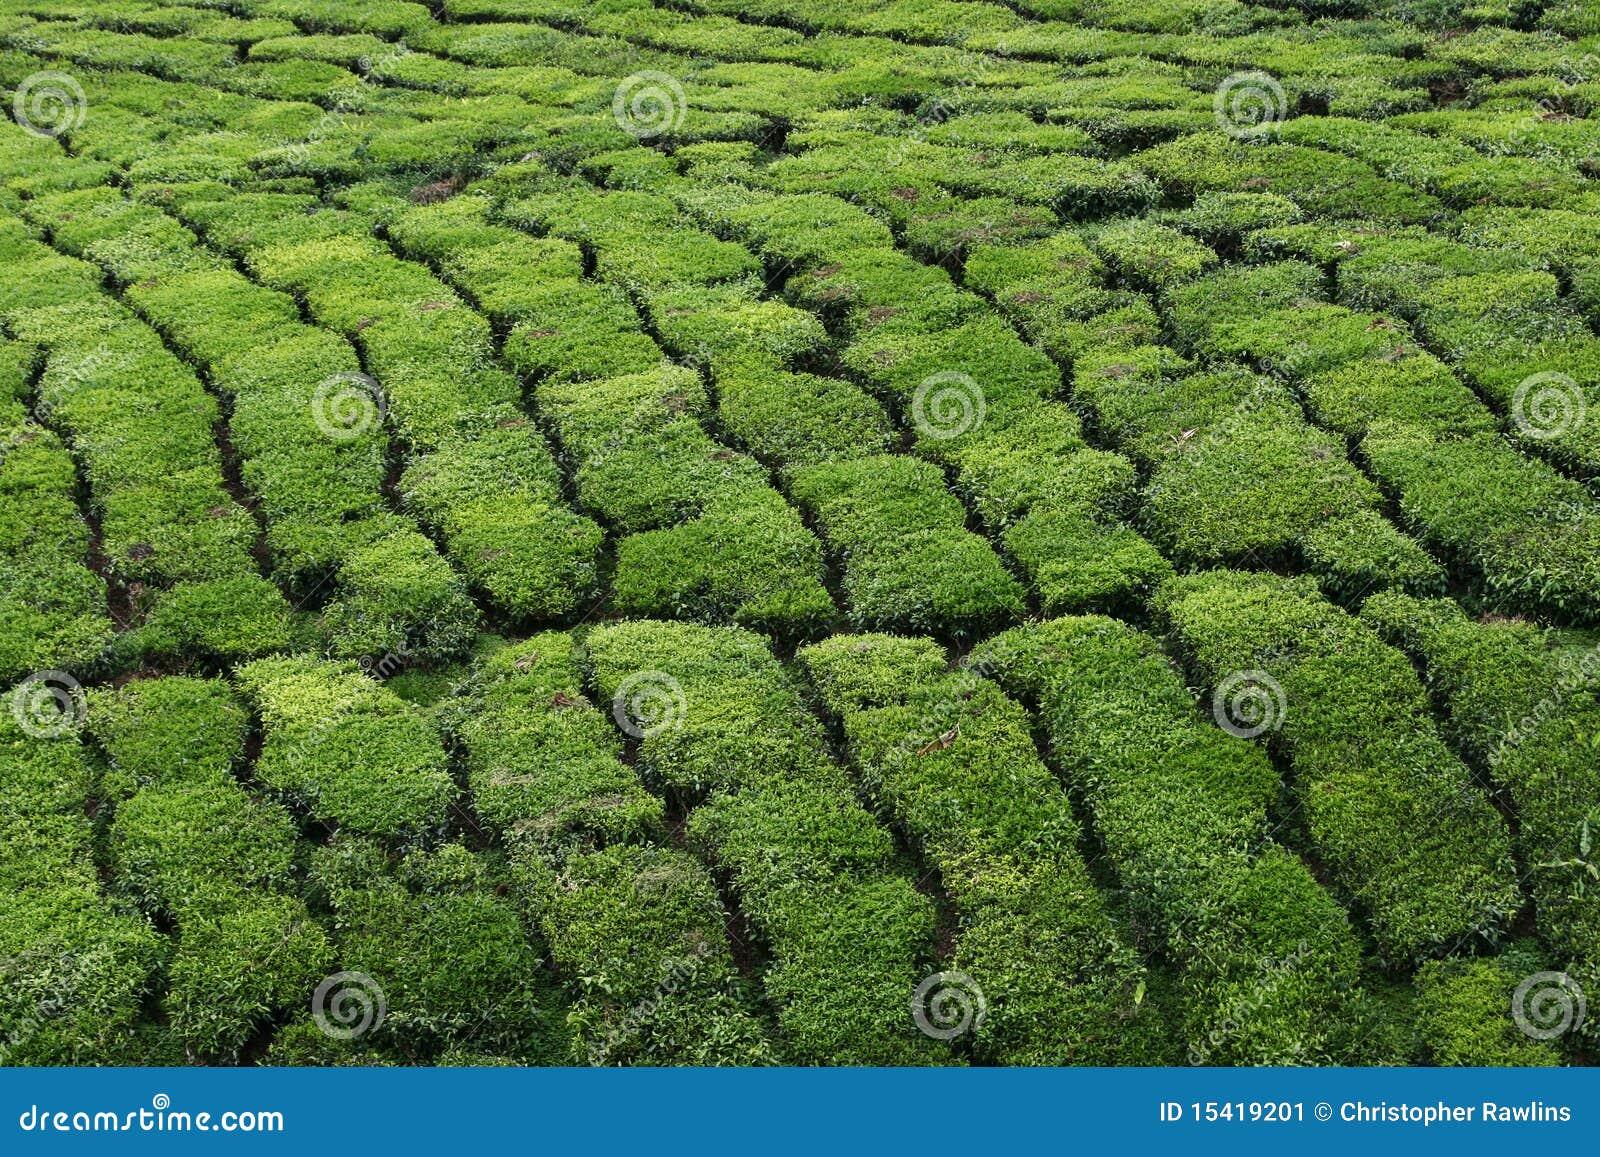 Tea Plantation - Close Up